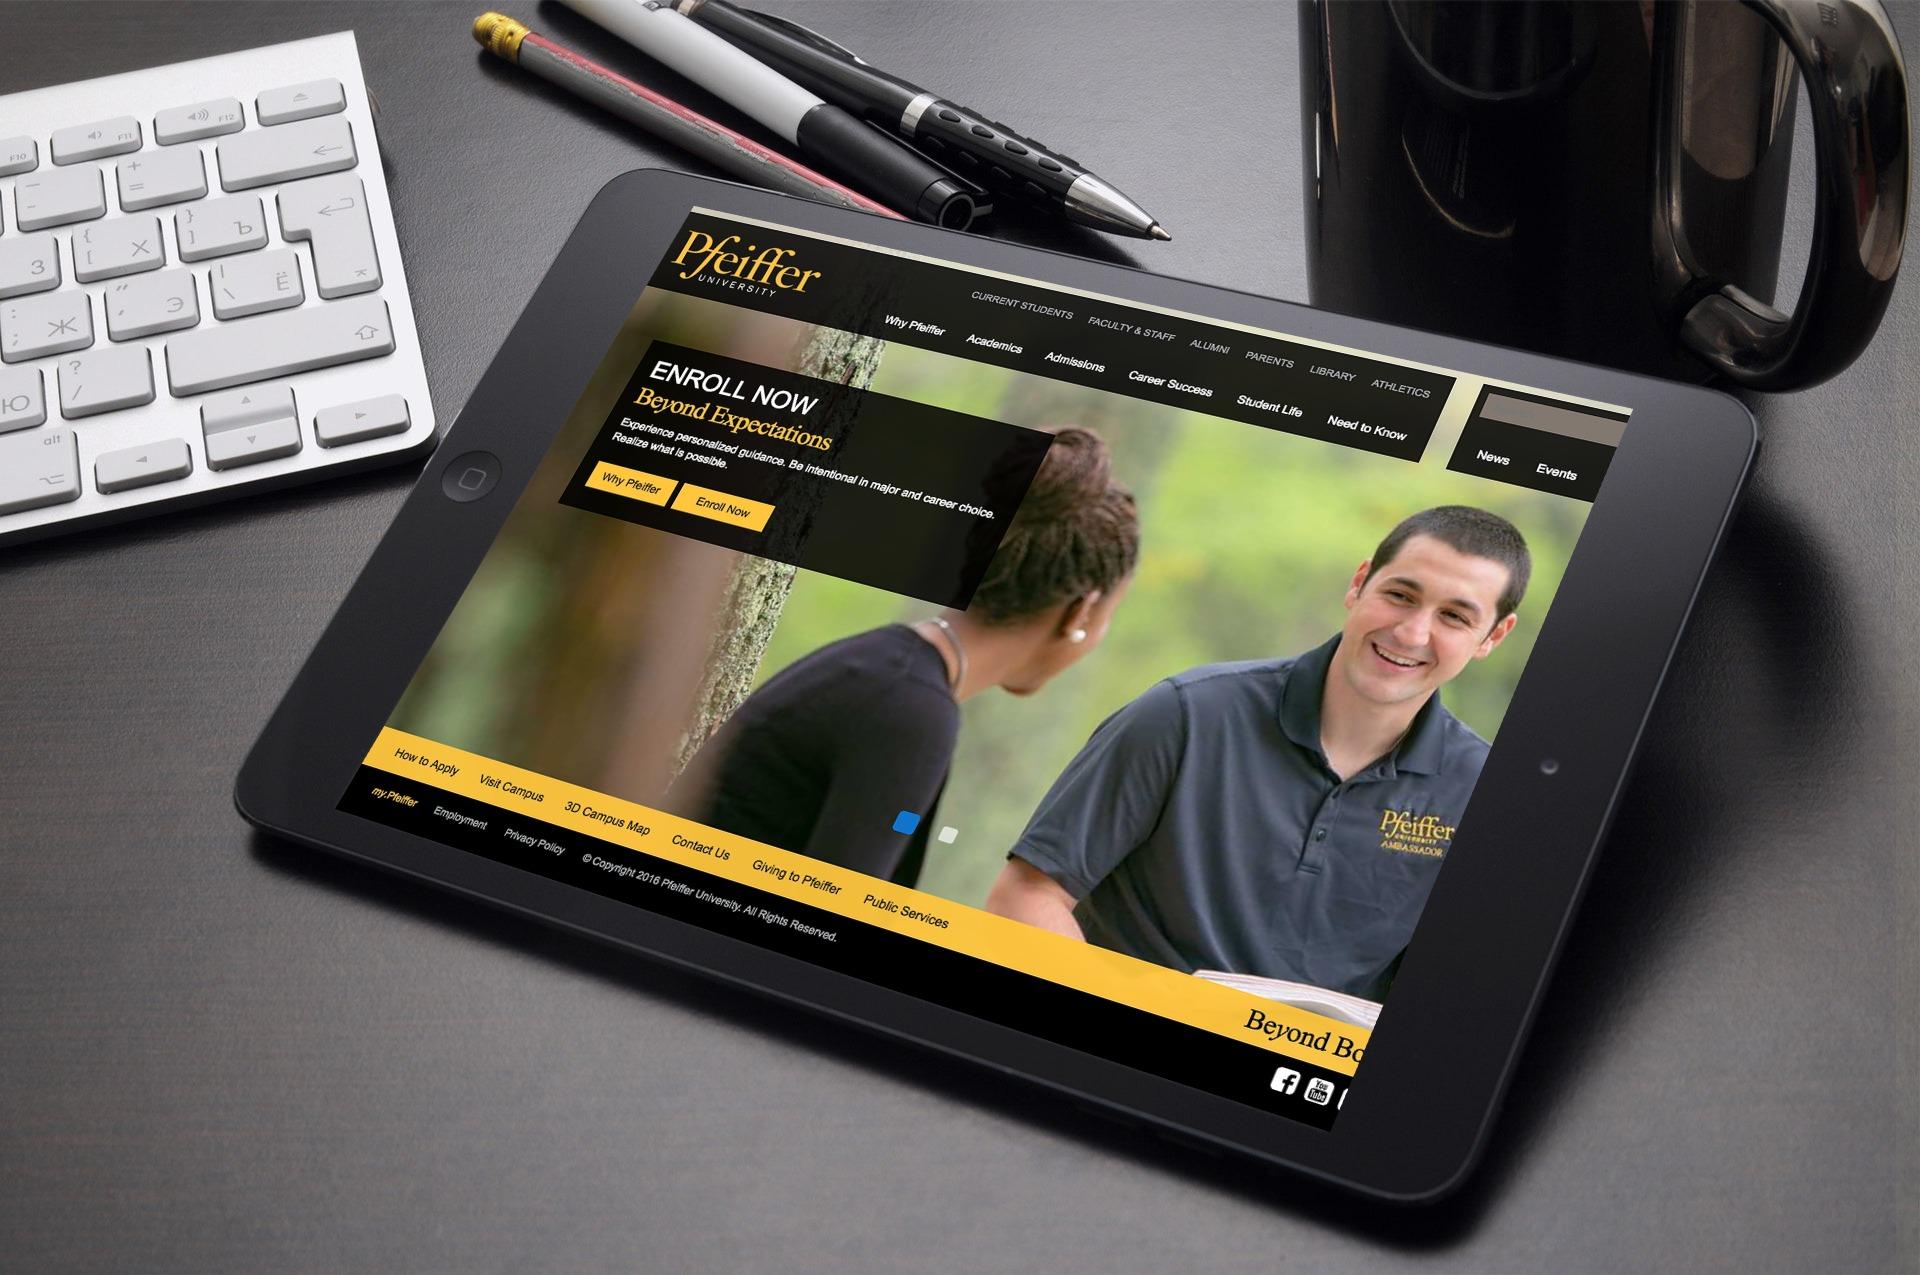 Pfeiffer tablet smartmockups_jkoj3kqy